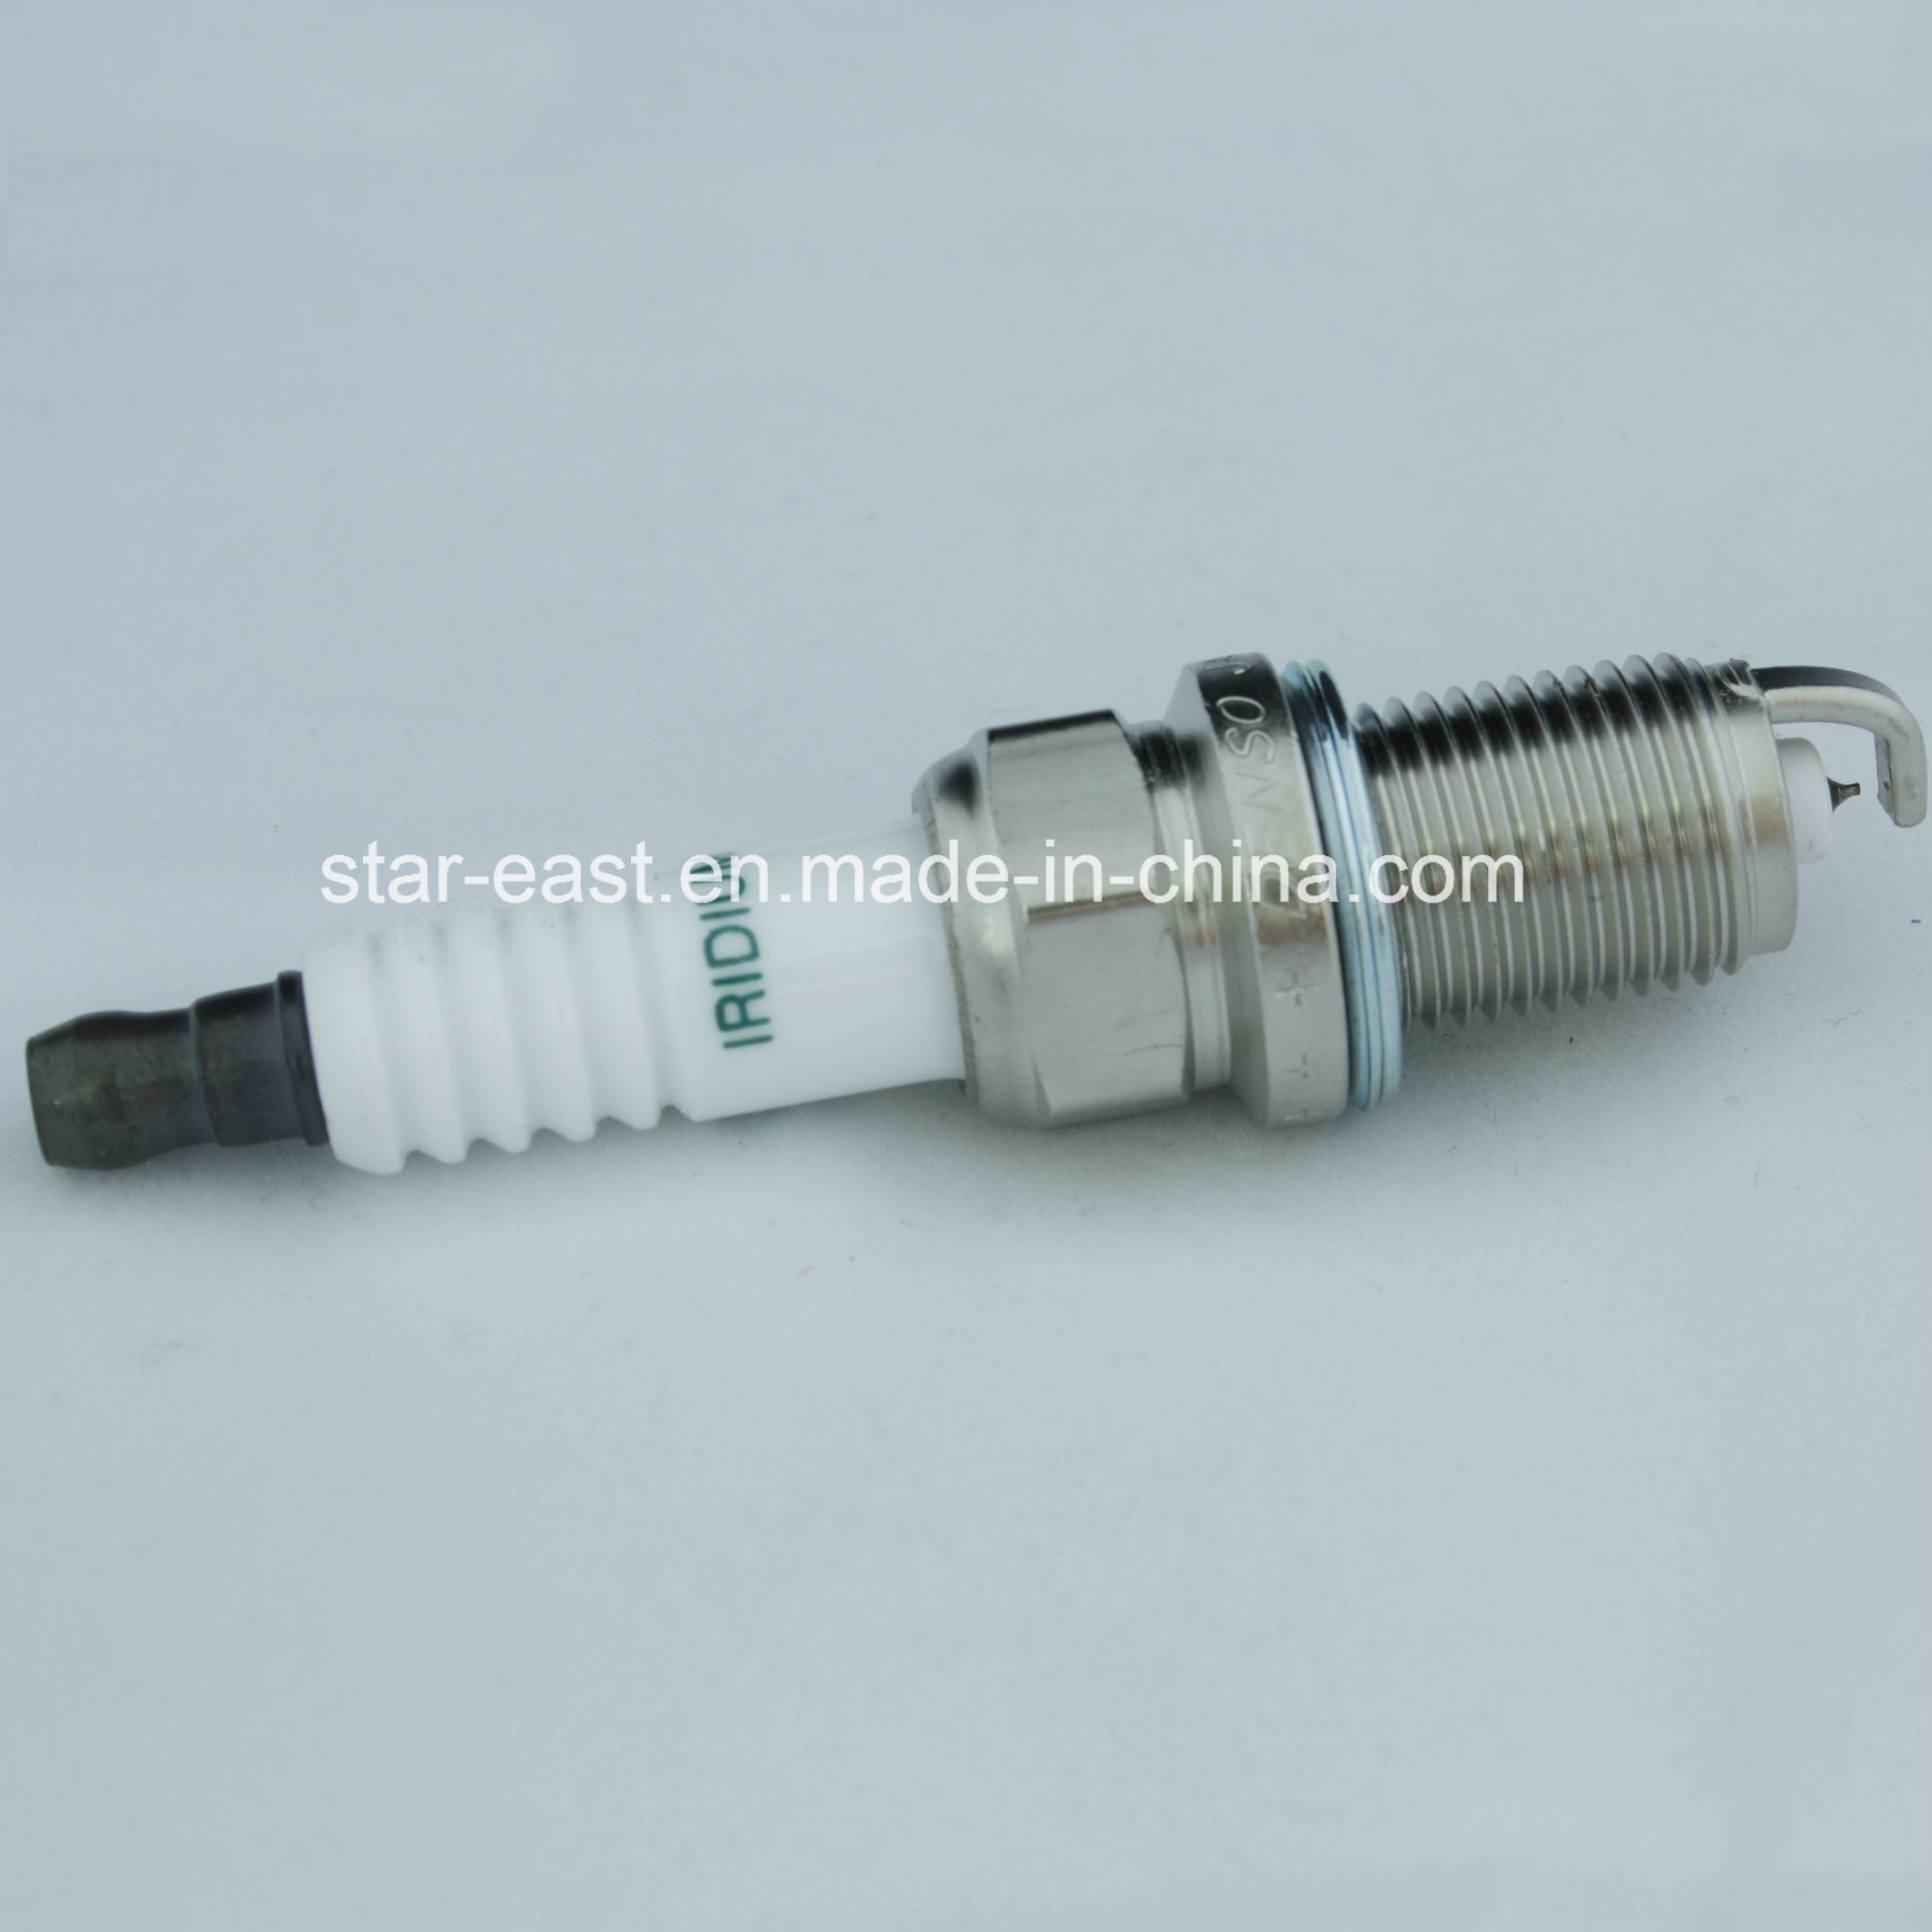 Iridium Power Spark Plug for Denso Sk20 Toyota/Nissan/BMW